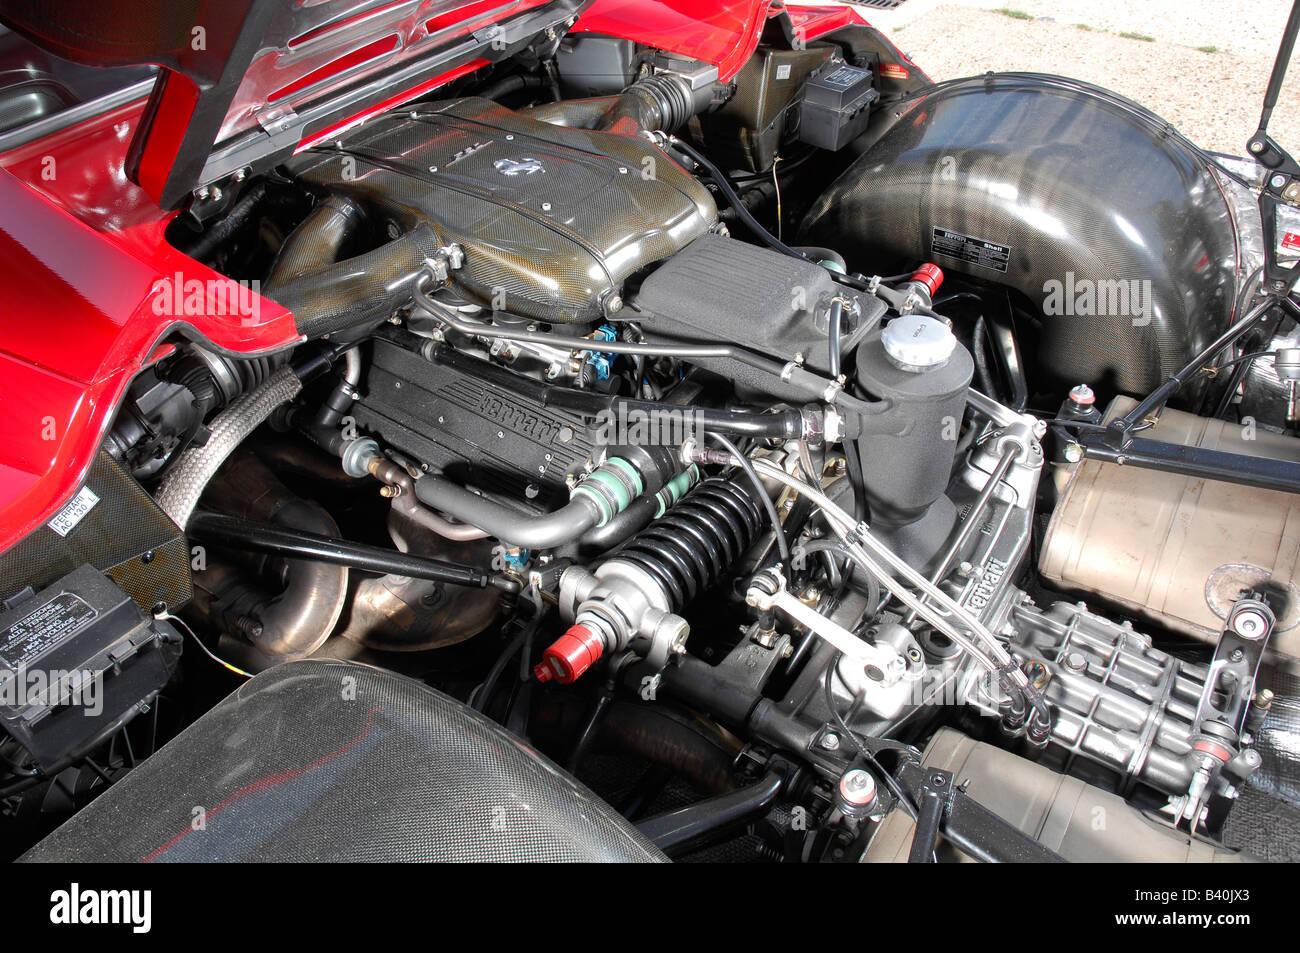 Ferrari F50 1995 Stock Photo Alamy